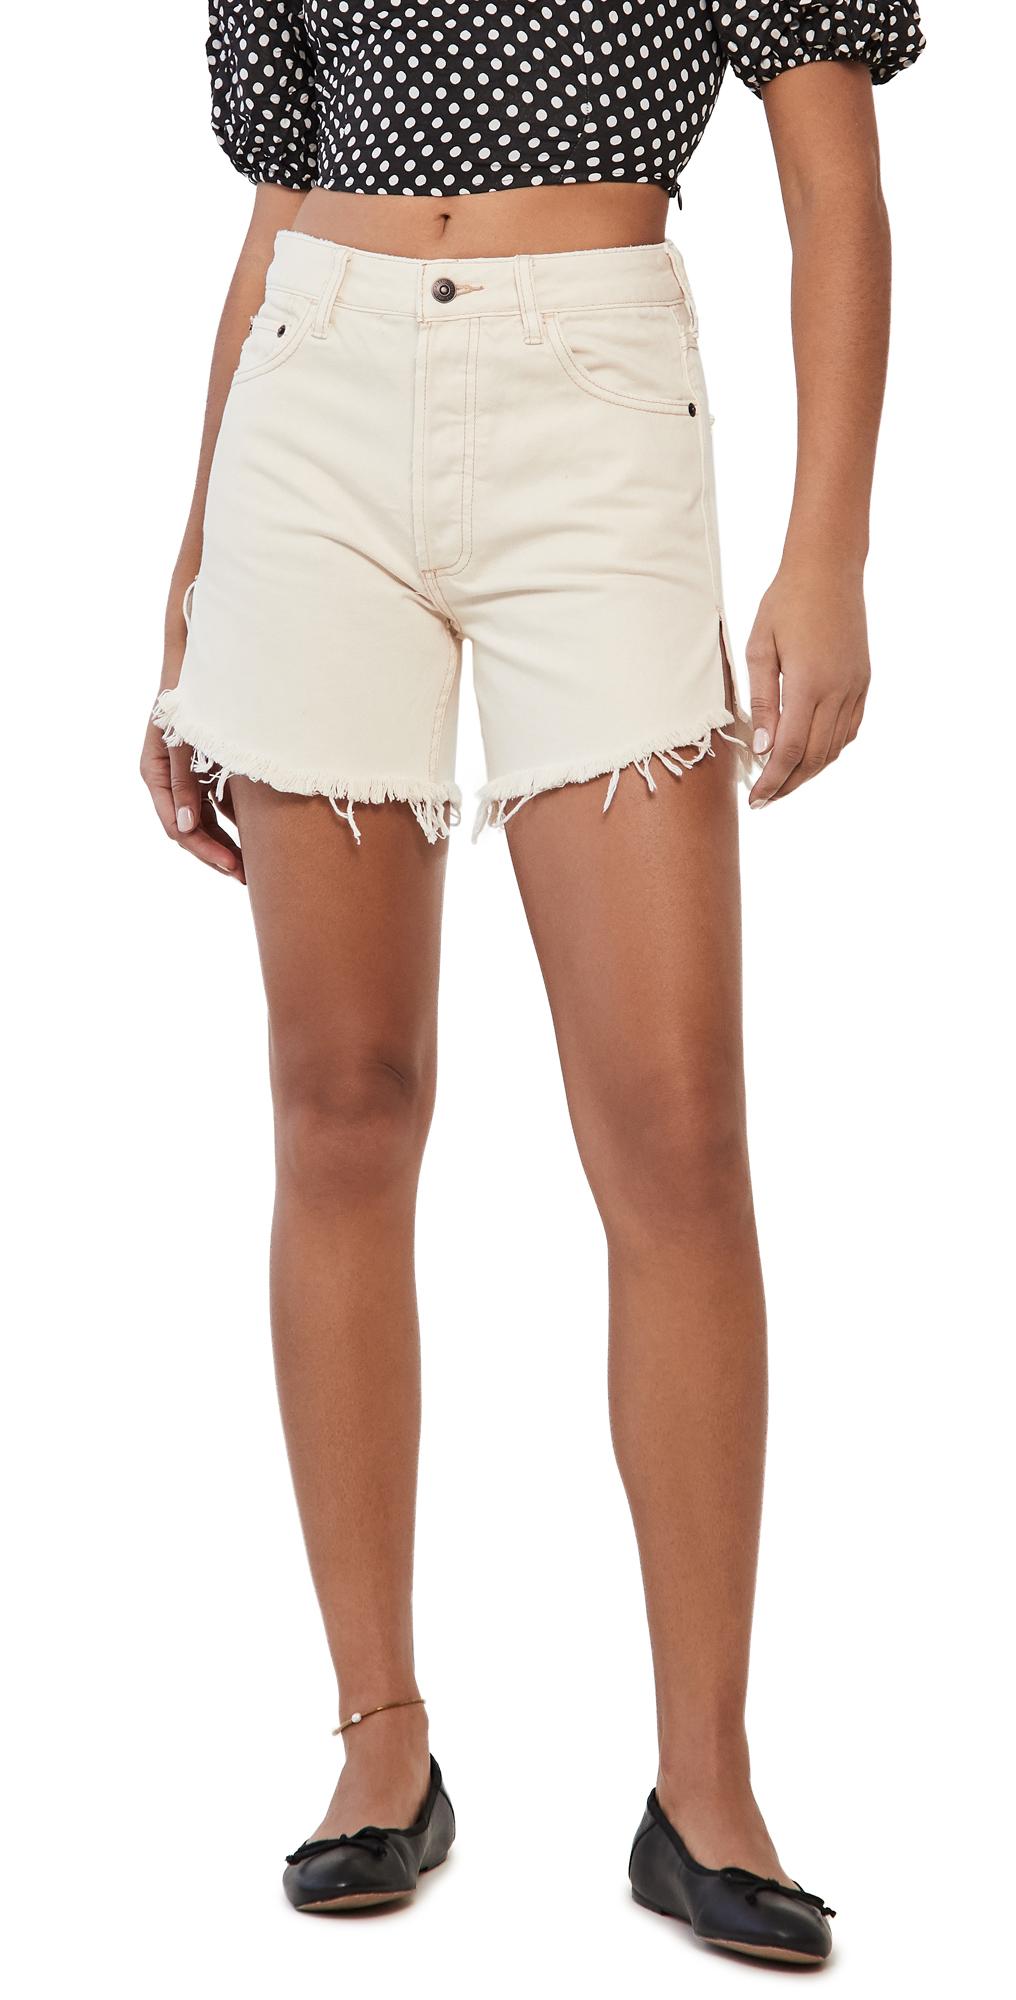 Free People Baggy Tomboy Shorts